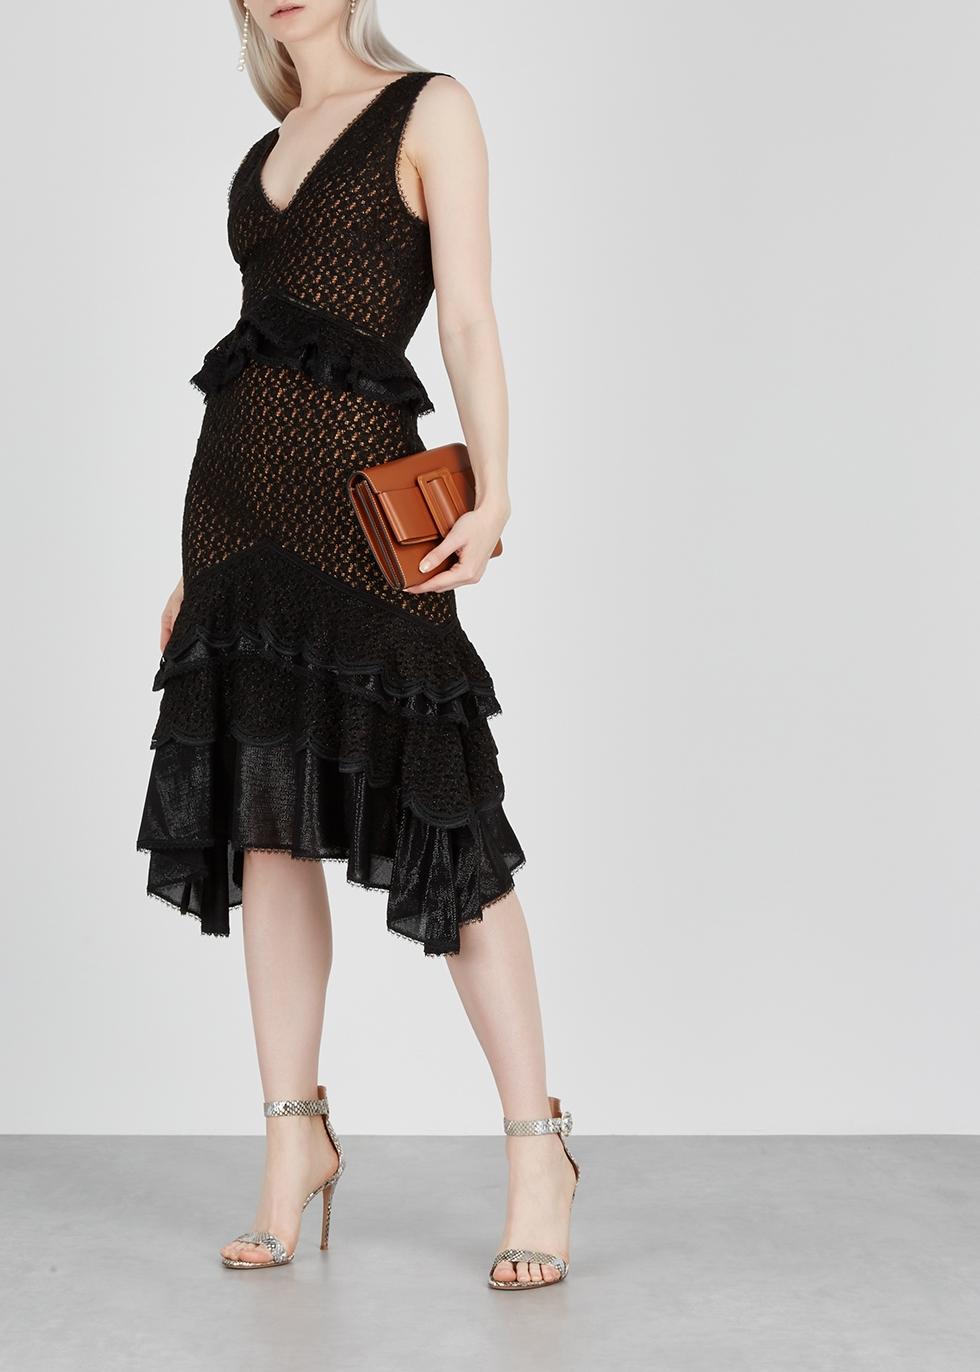 Designer Dresses   Designer Gowns - Harvey Nichols 55c5109ba